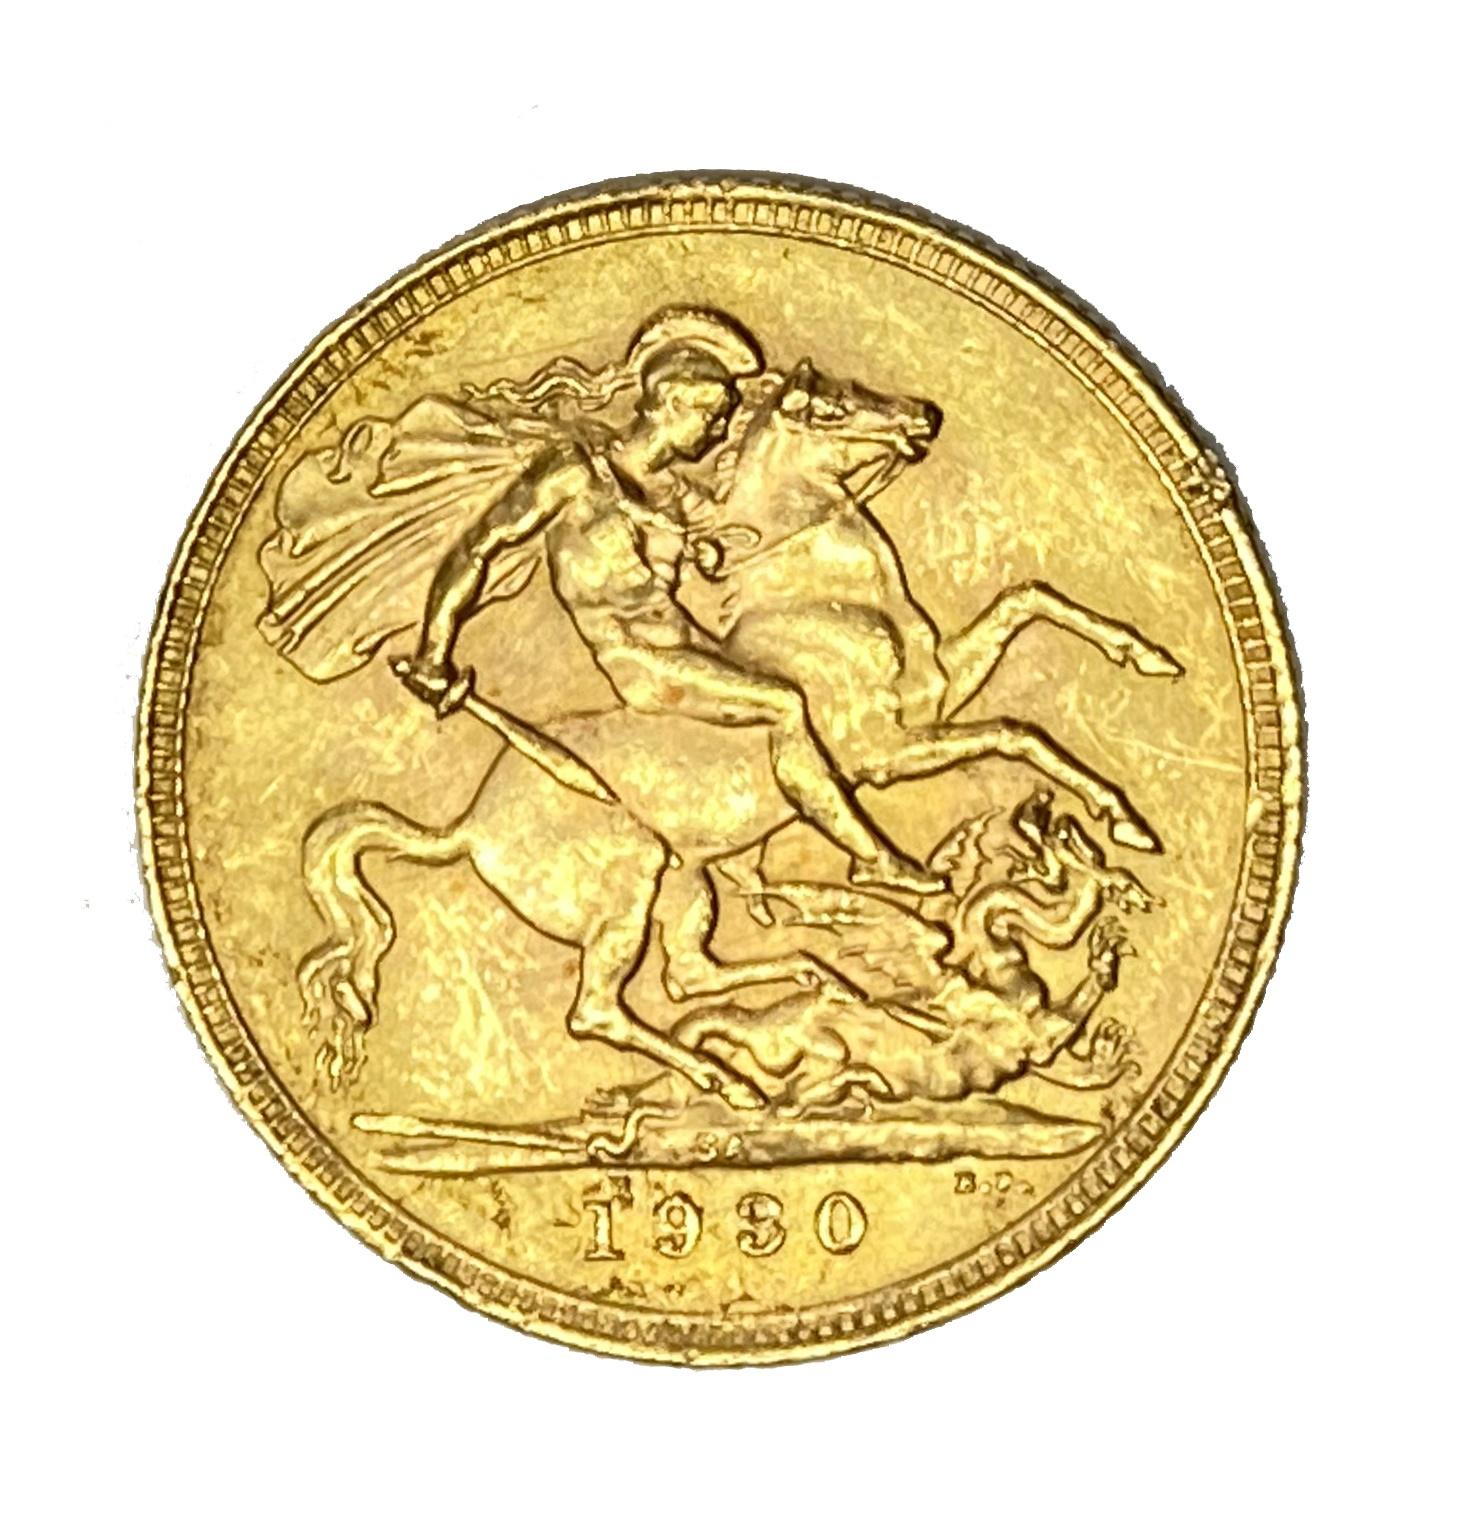 George V gold Sovereign coin, 1930, Pretoria mint - Image 2 of 2